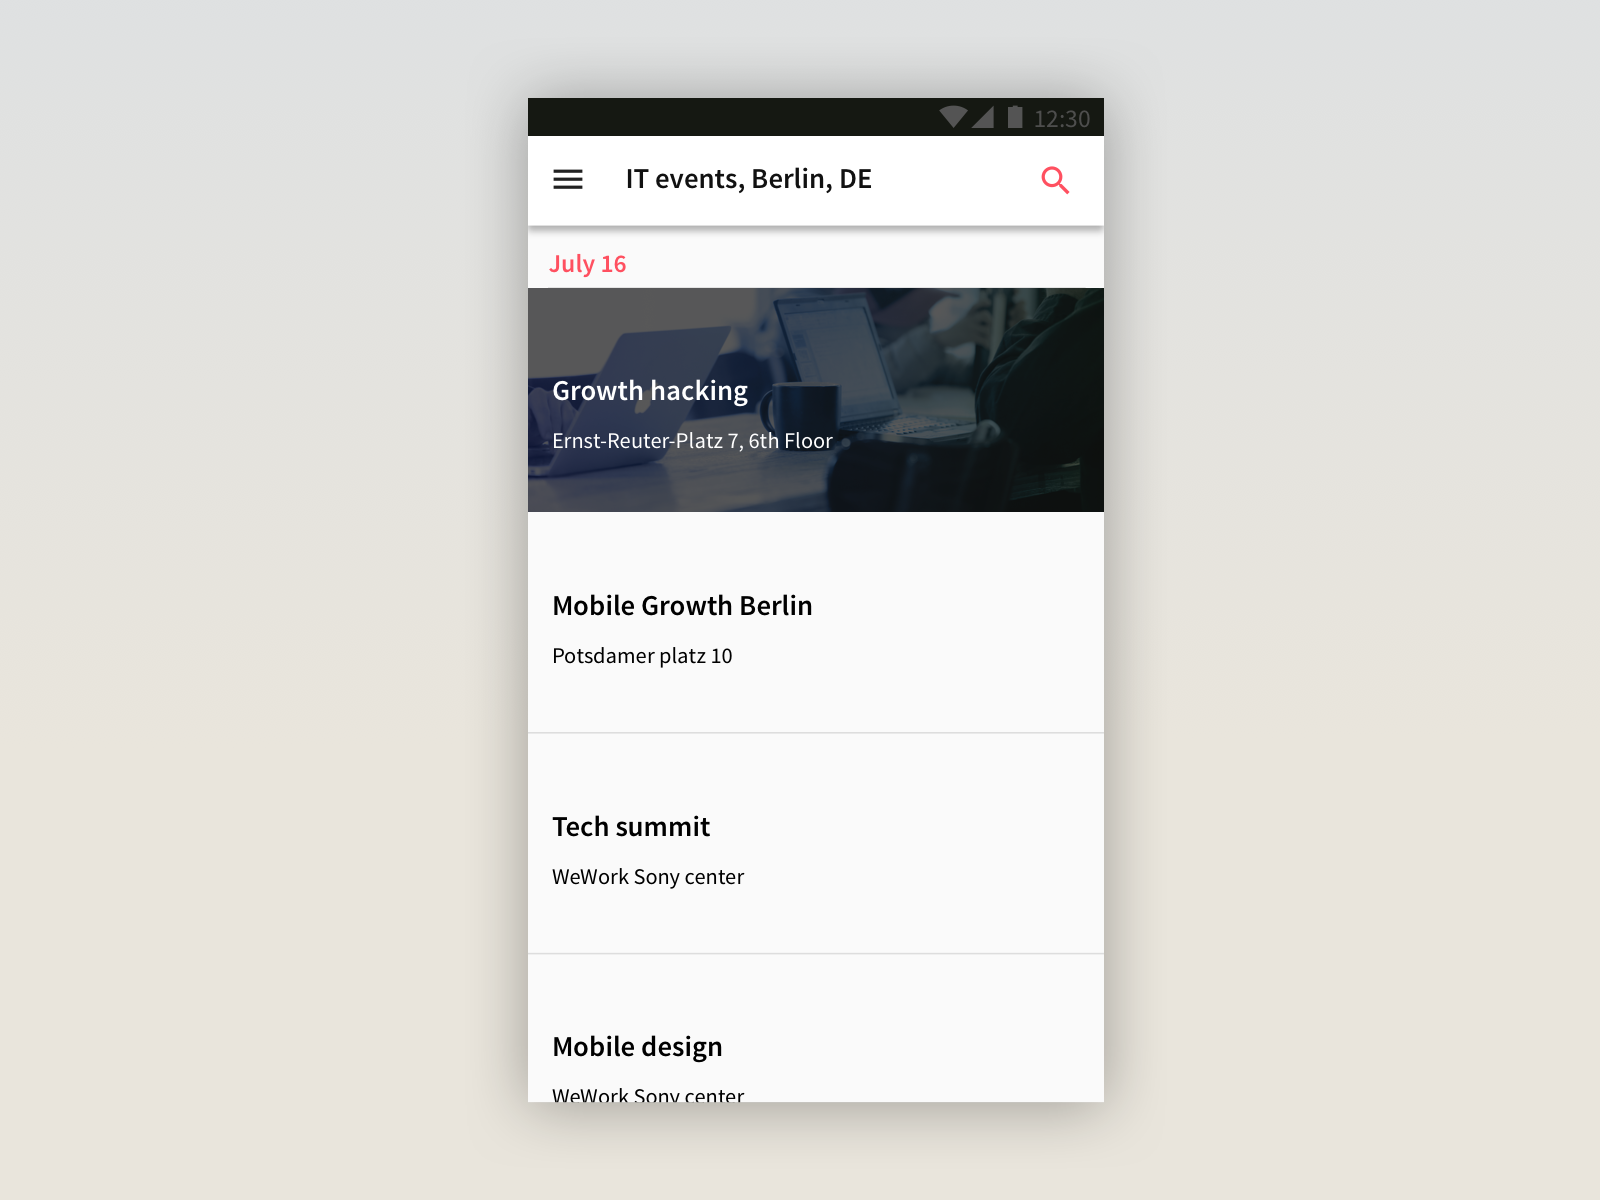 The UX/UI design follows Google material design guidelines.